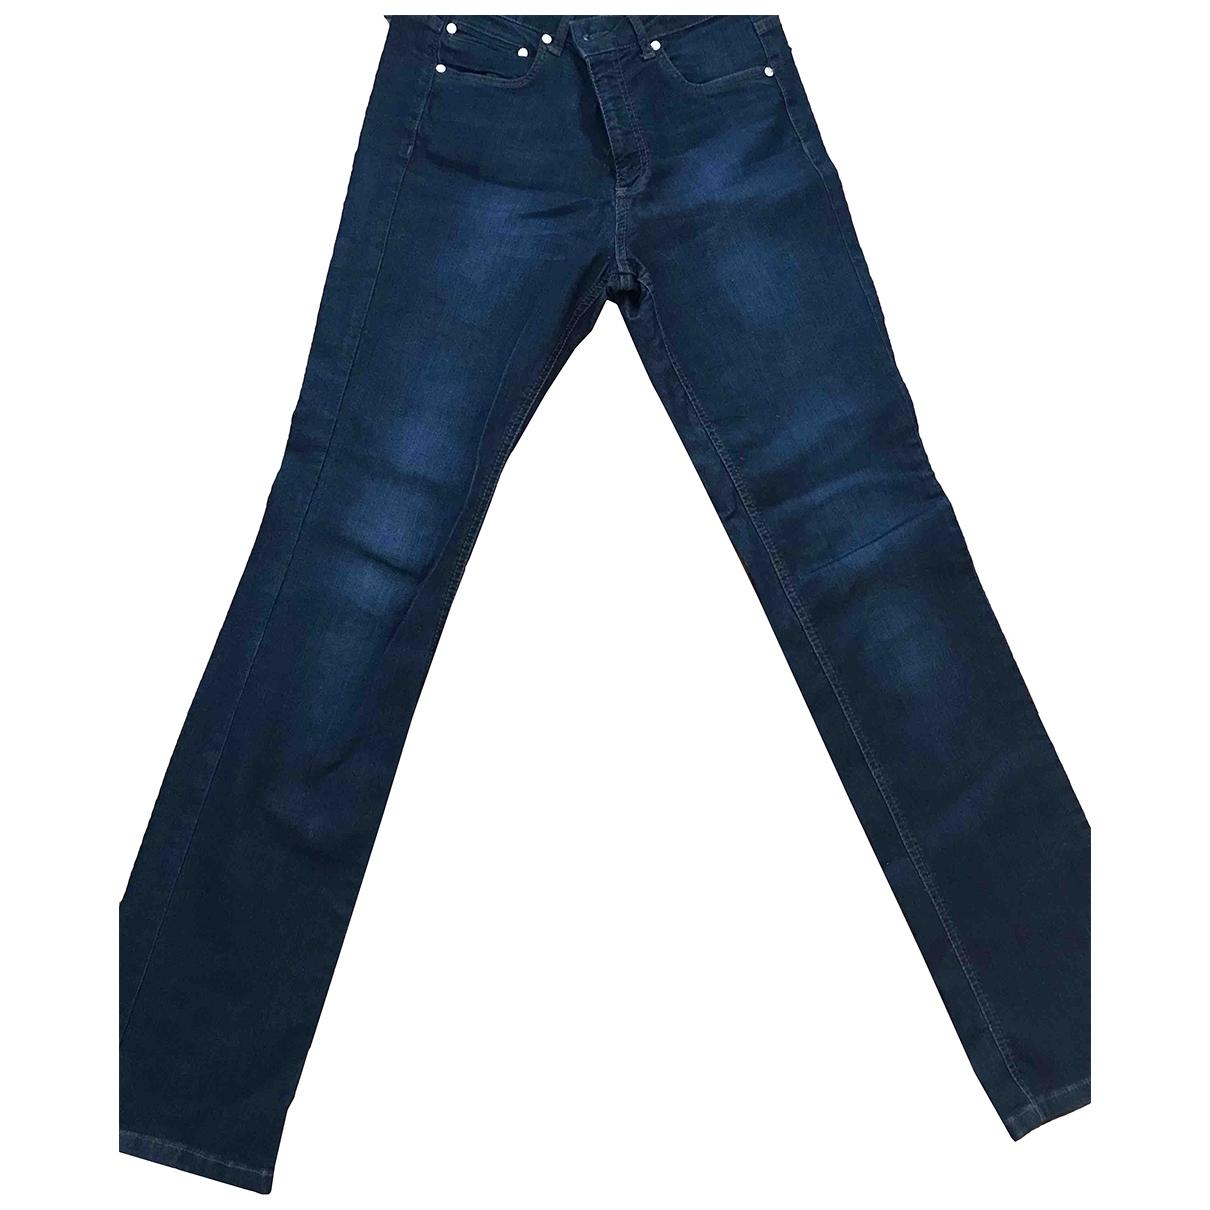 Roberto Cavalli \N Blue Denim - Jeans Jeans for Women 28 US